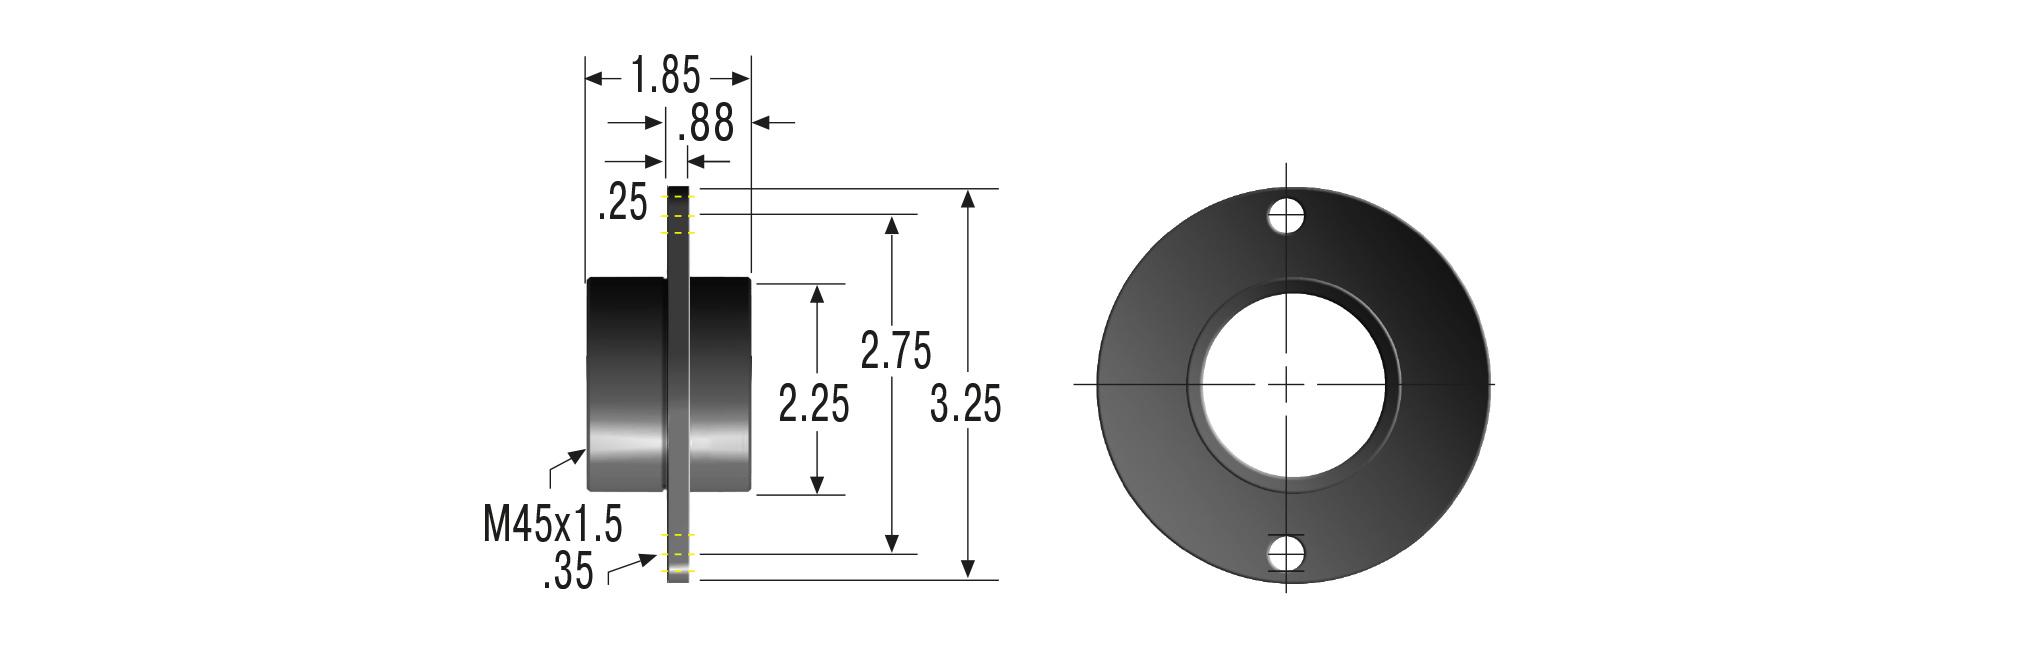 Flansch mit integrierter Anschlaghülse M45x1,5 für MC45, MA45, ML45